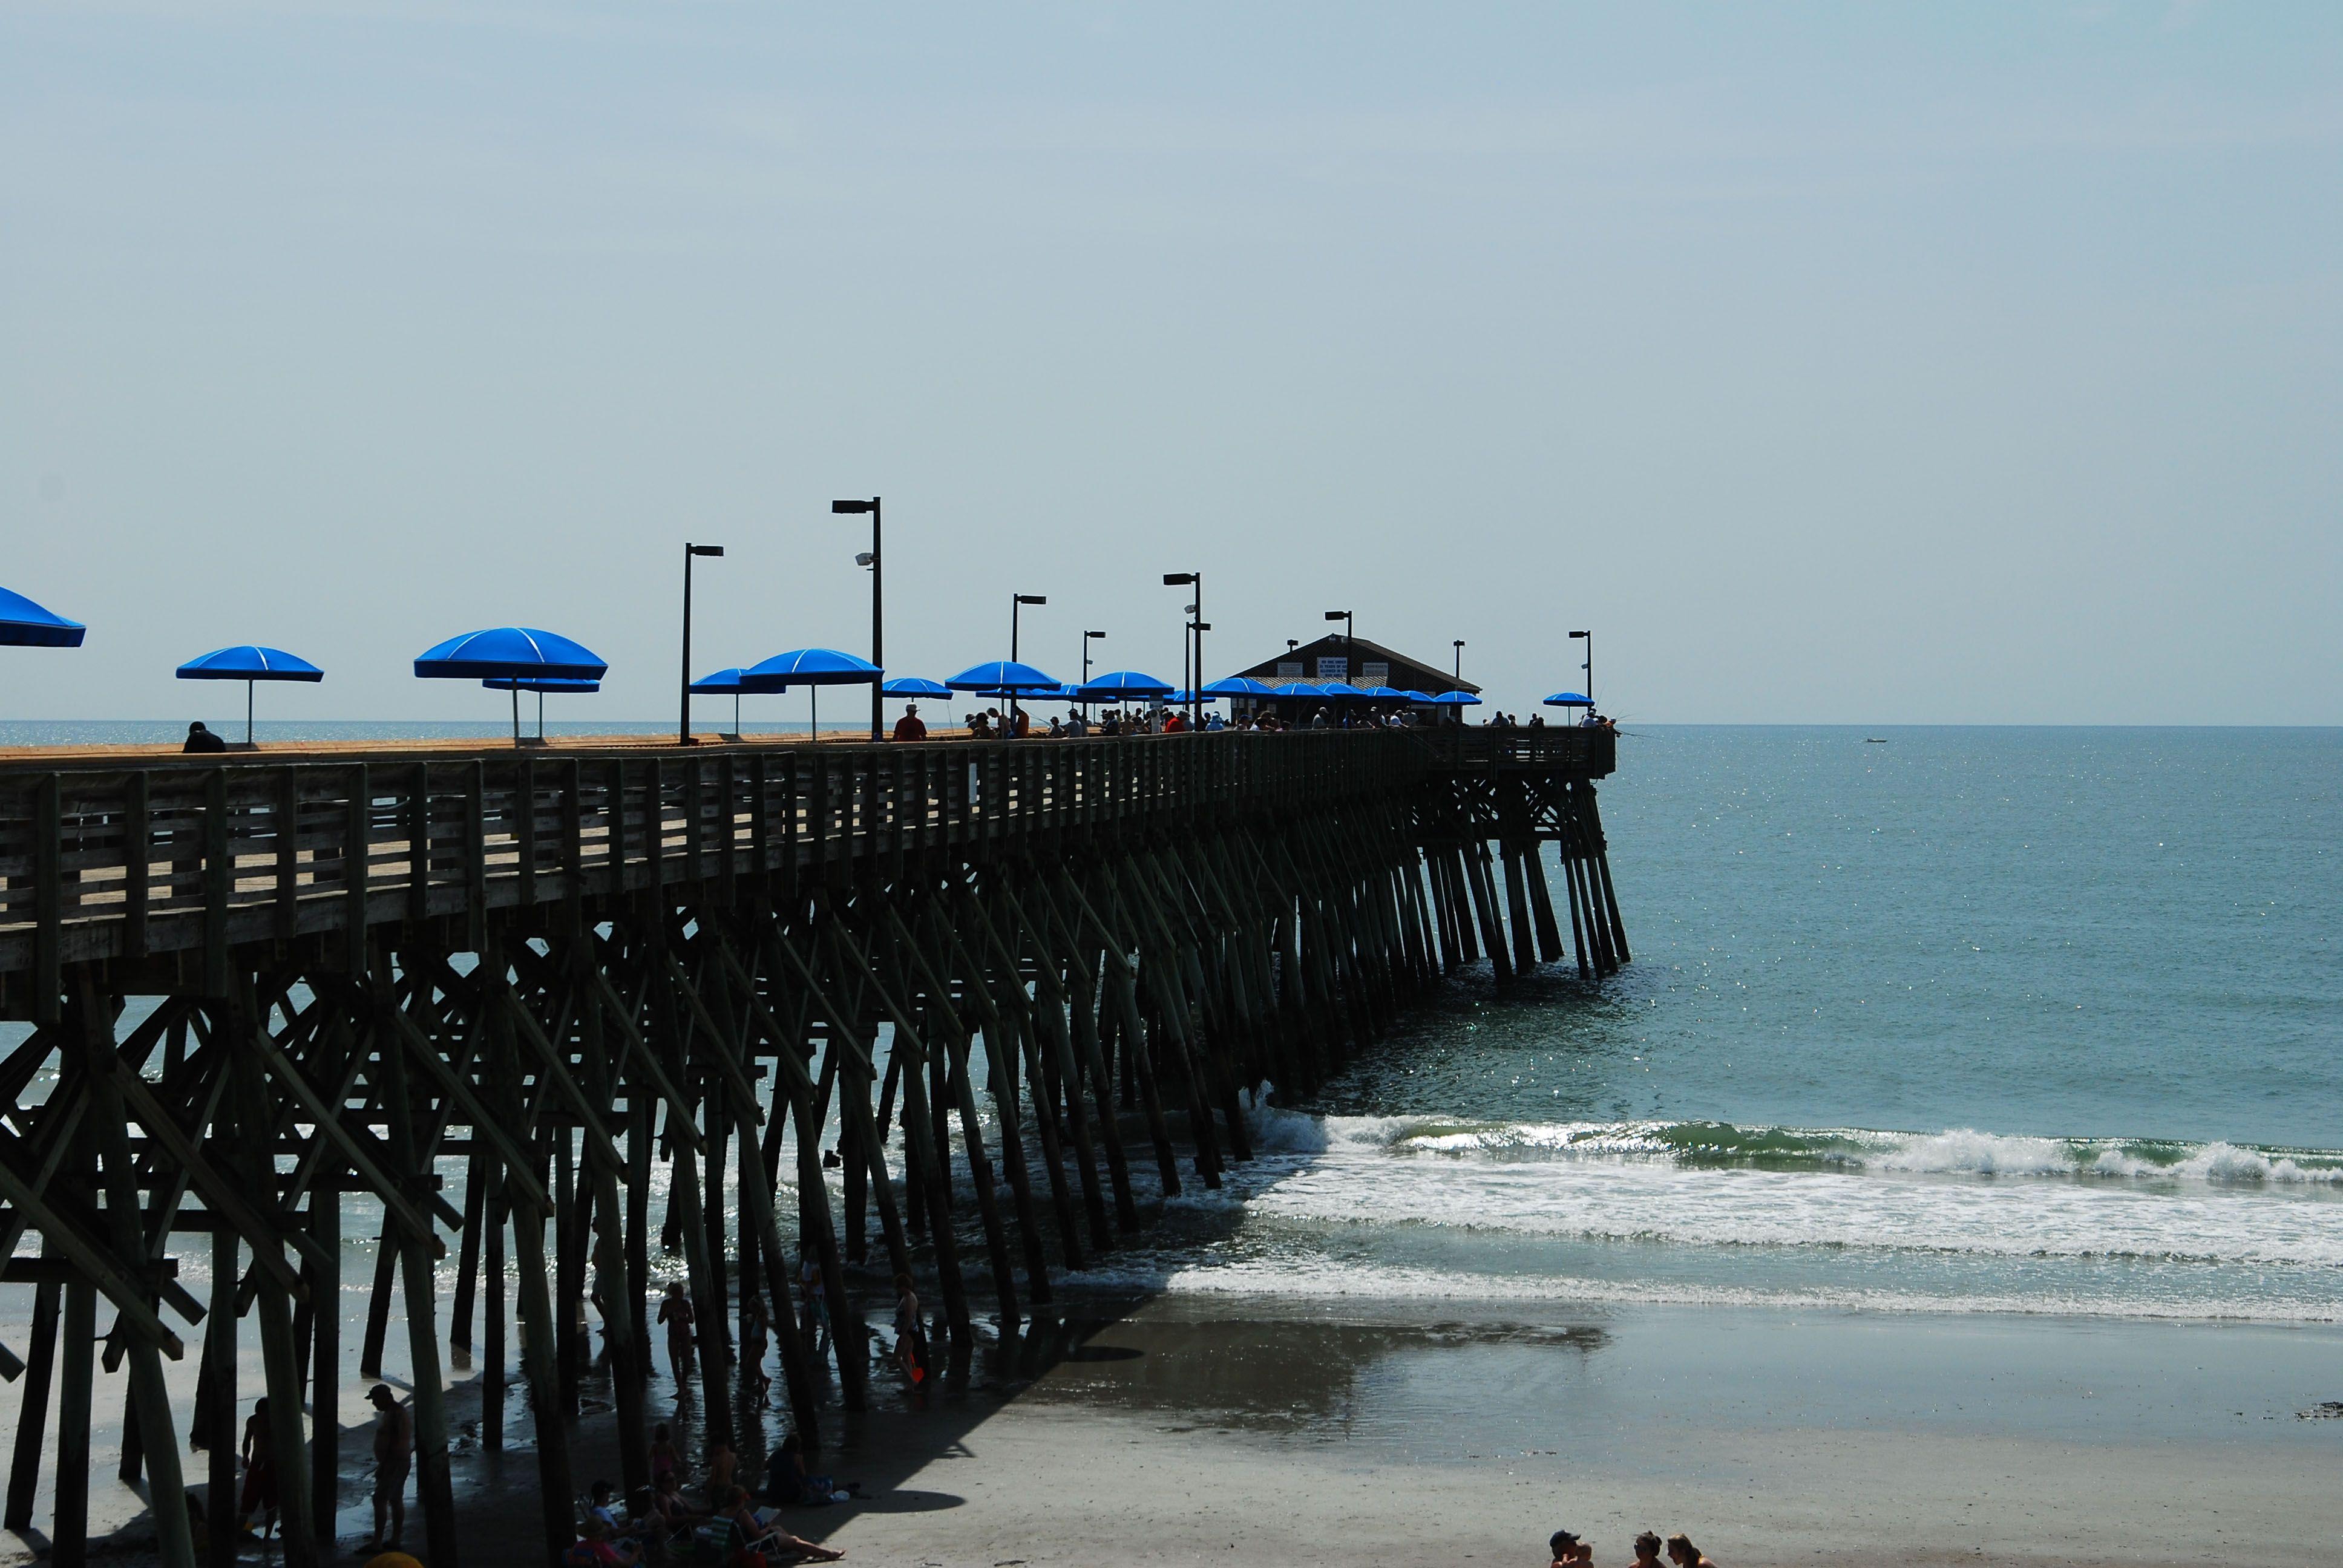 935c67a07e99eceecacad53dee963cd5 - Sea Gardens North Myrtle Beach South Carolina